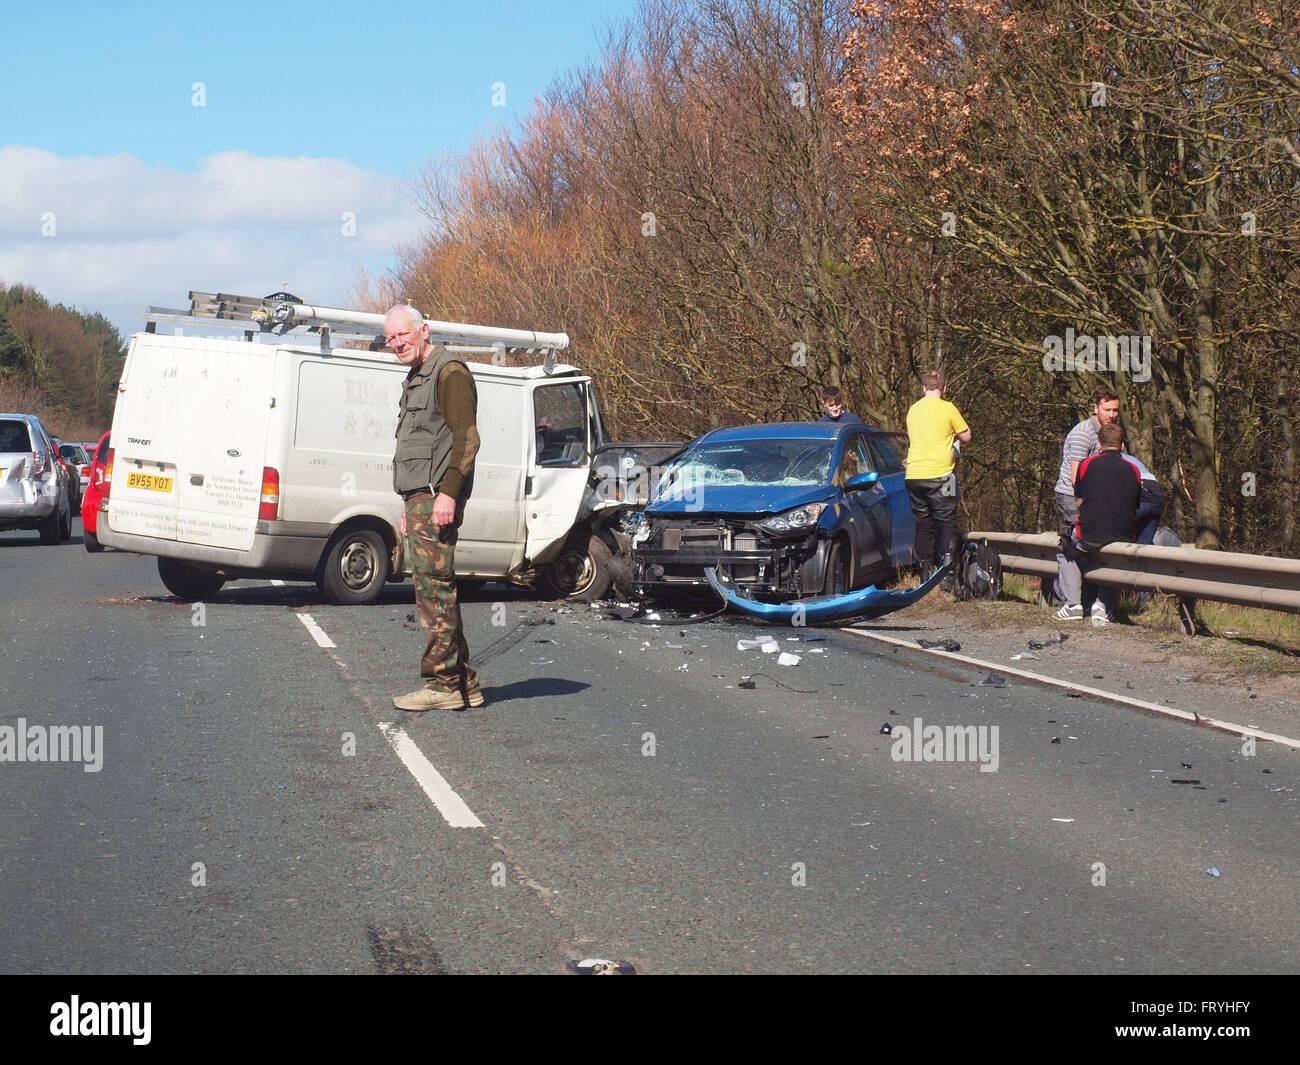 newcastle upon tyne, 25th march 2016, u.k. news. a multi vehicle car